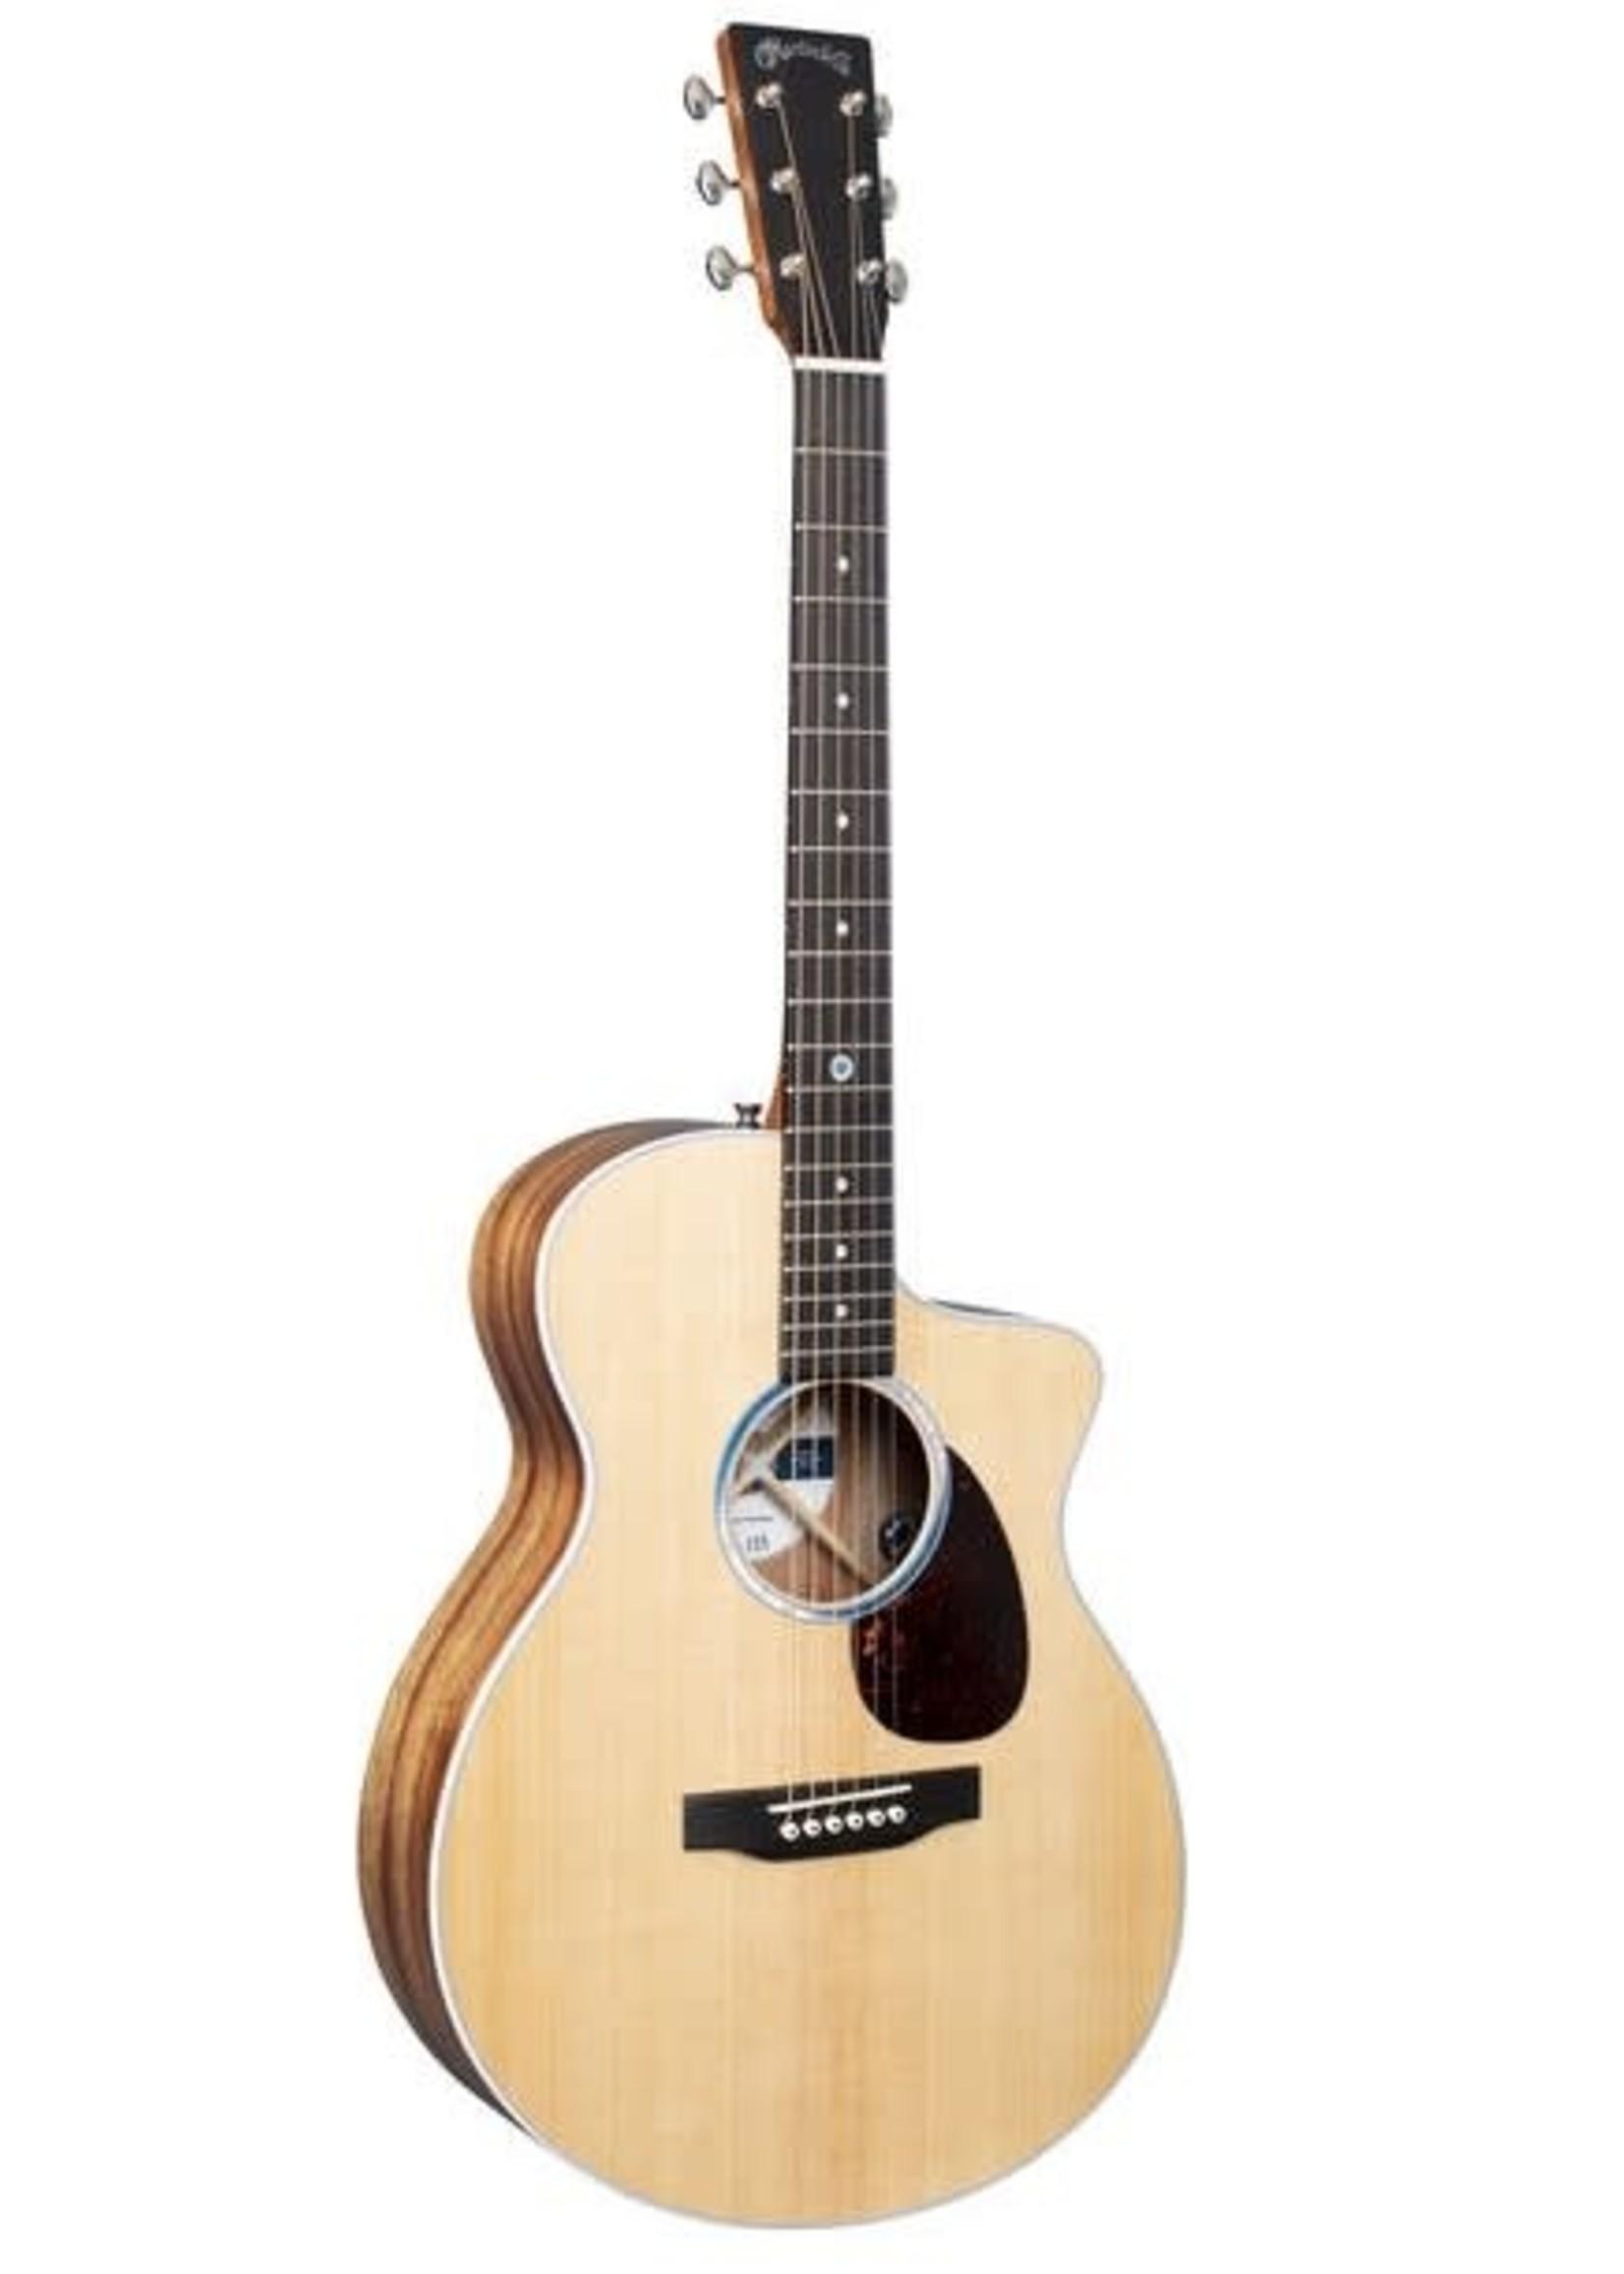 Martin Martin SC-13E-01 Road Series Acoustic Electric Guitar